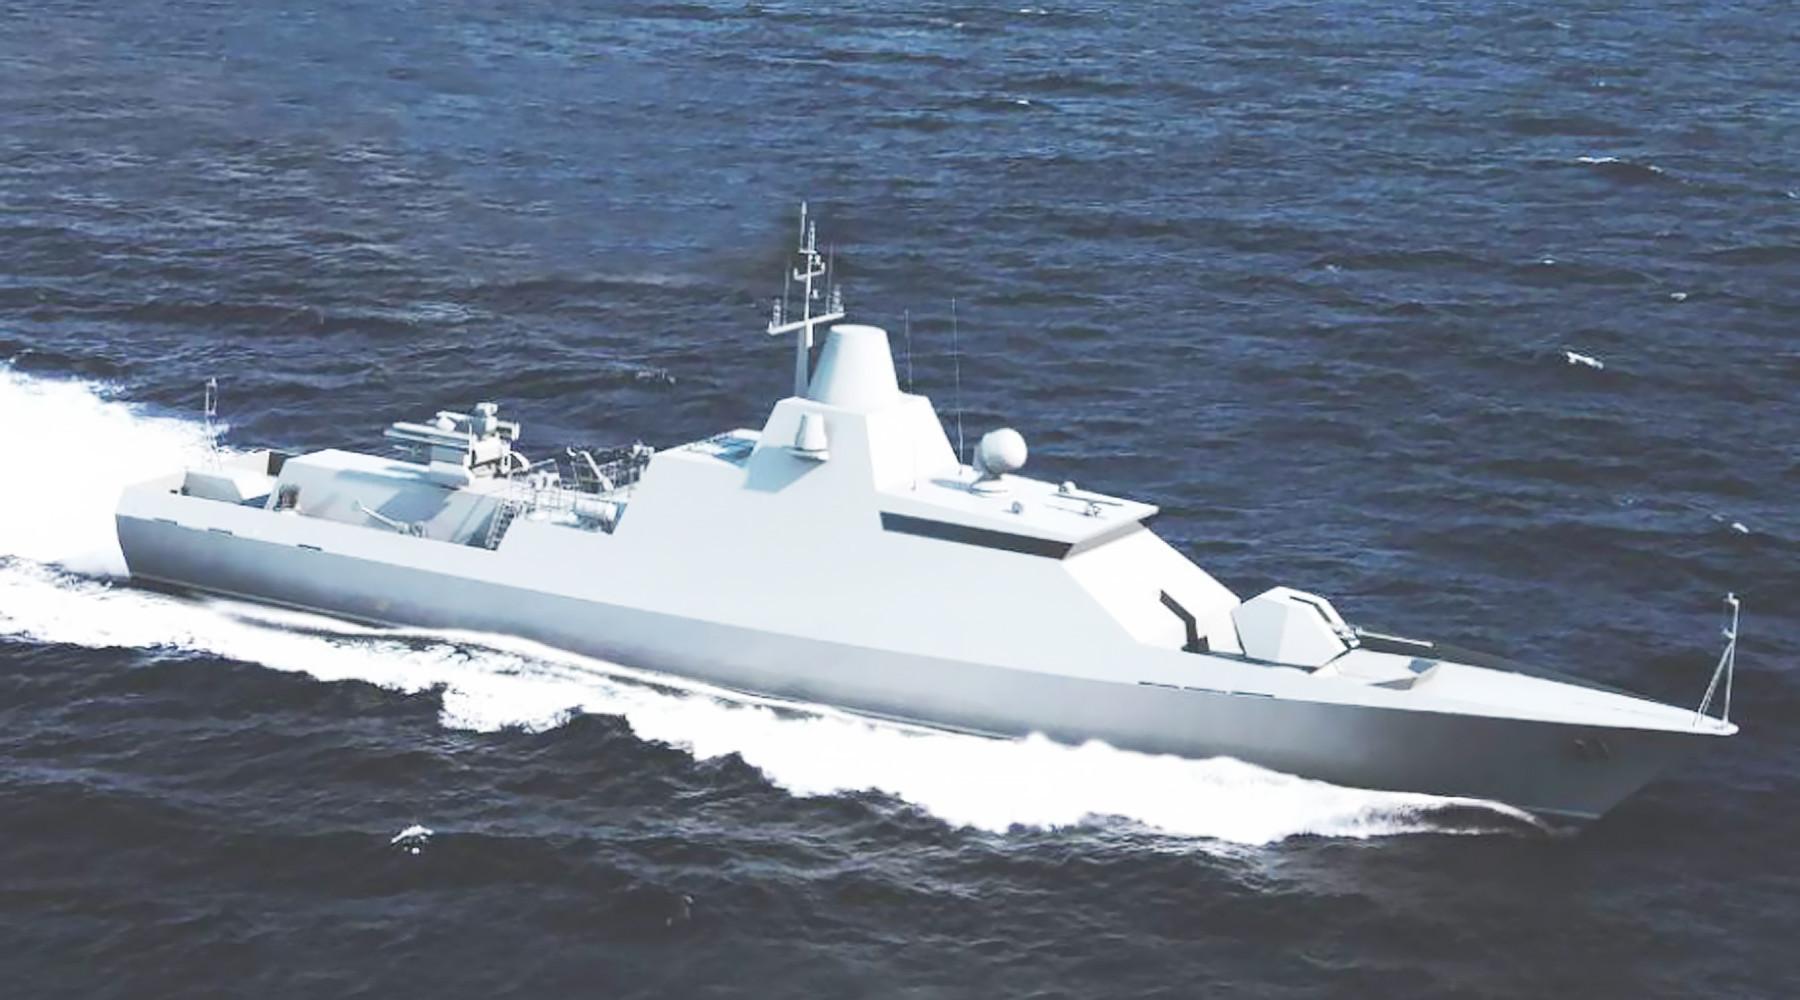 Мал, да опасен и удал: в российском флоте пополнение!